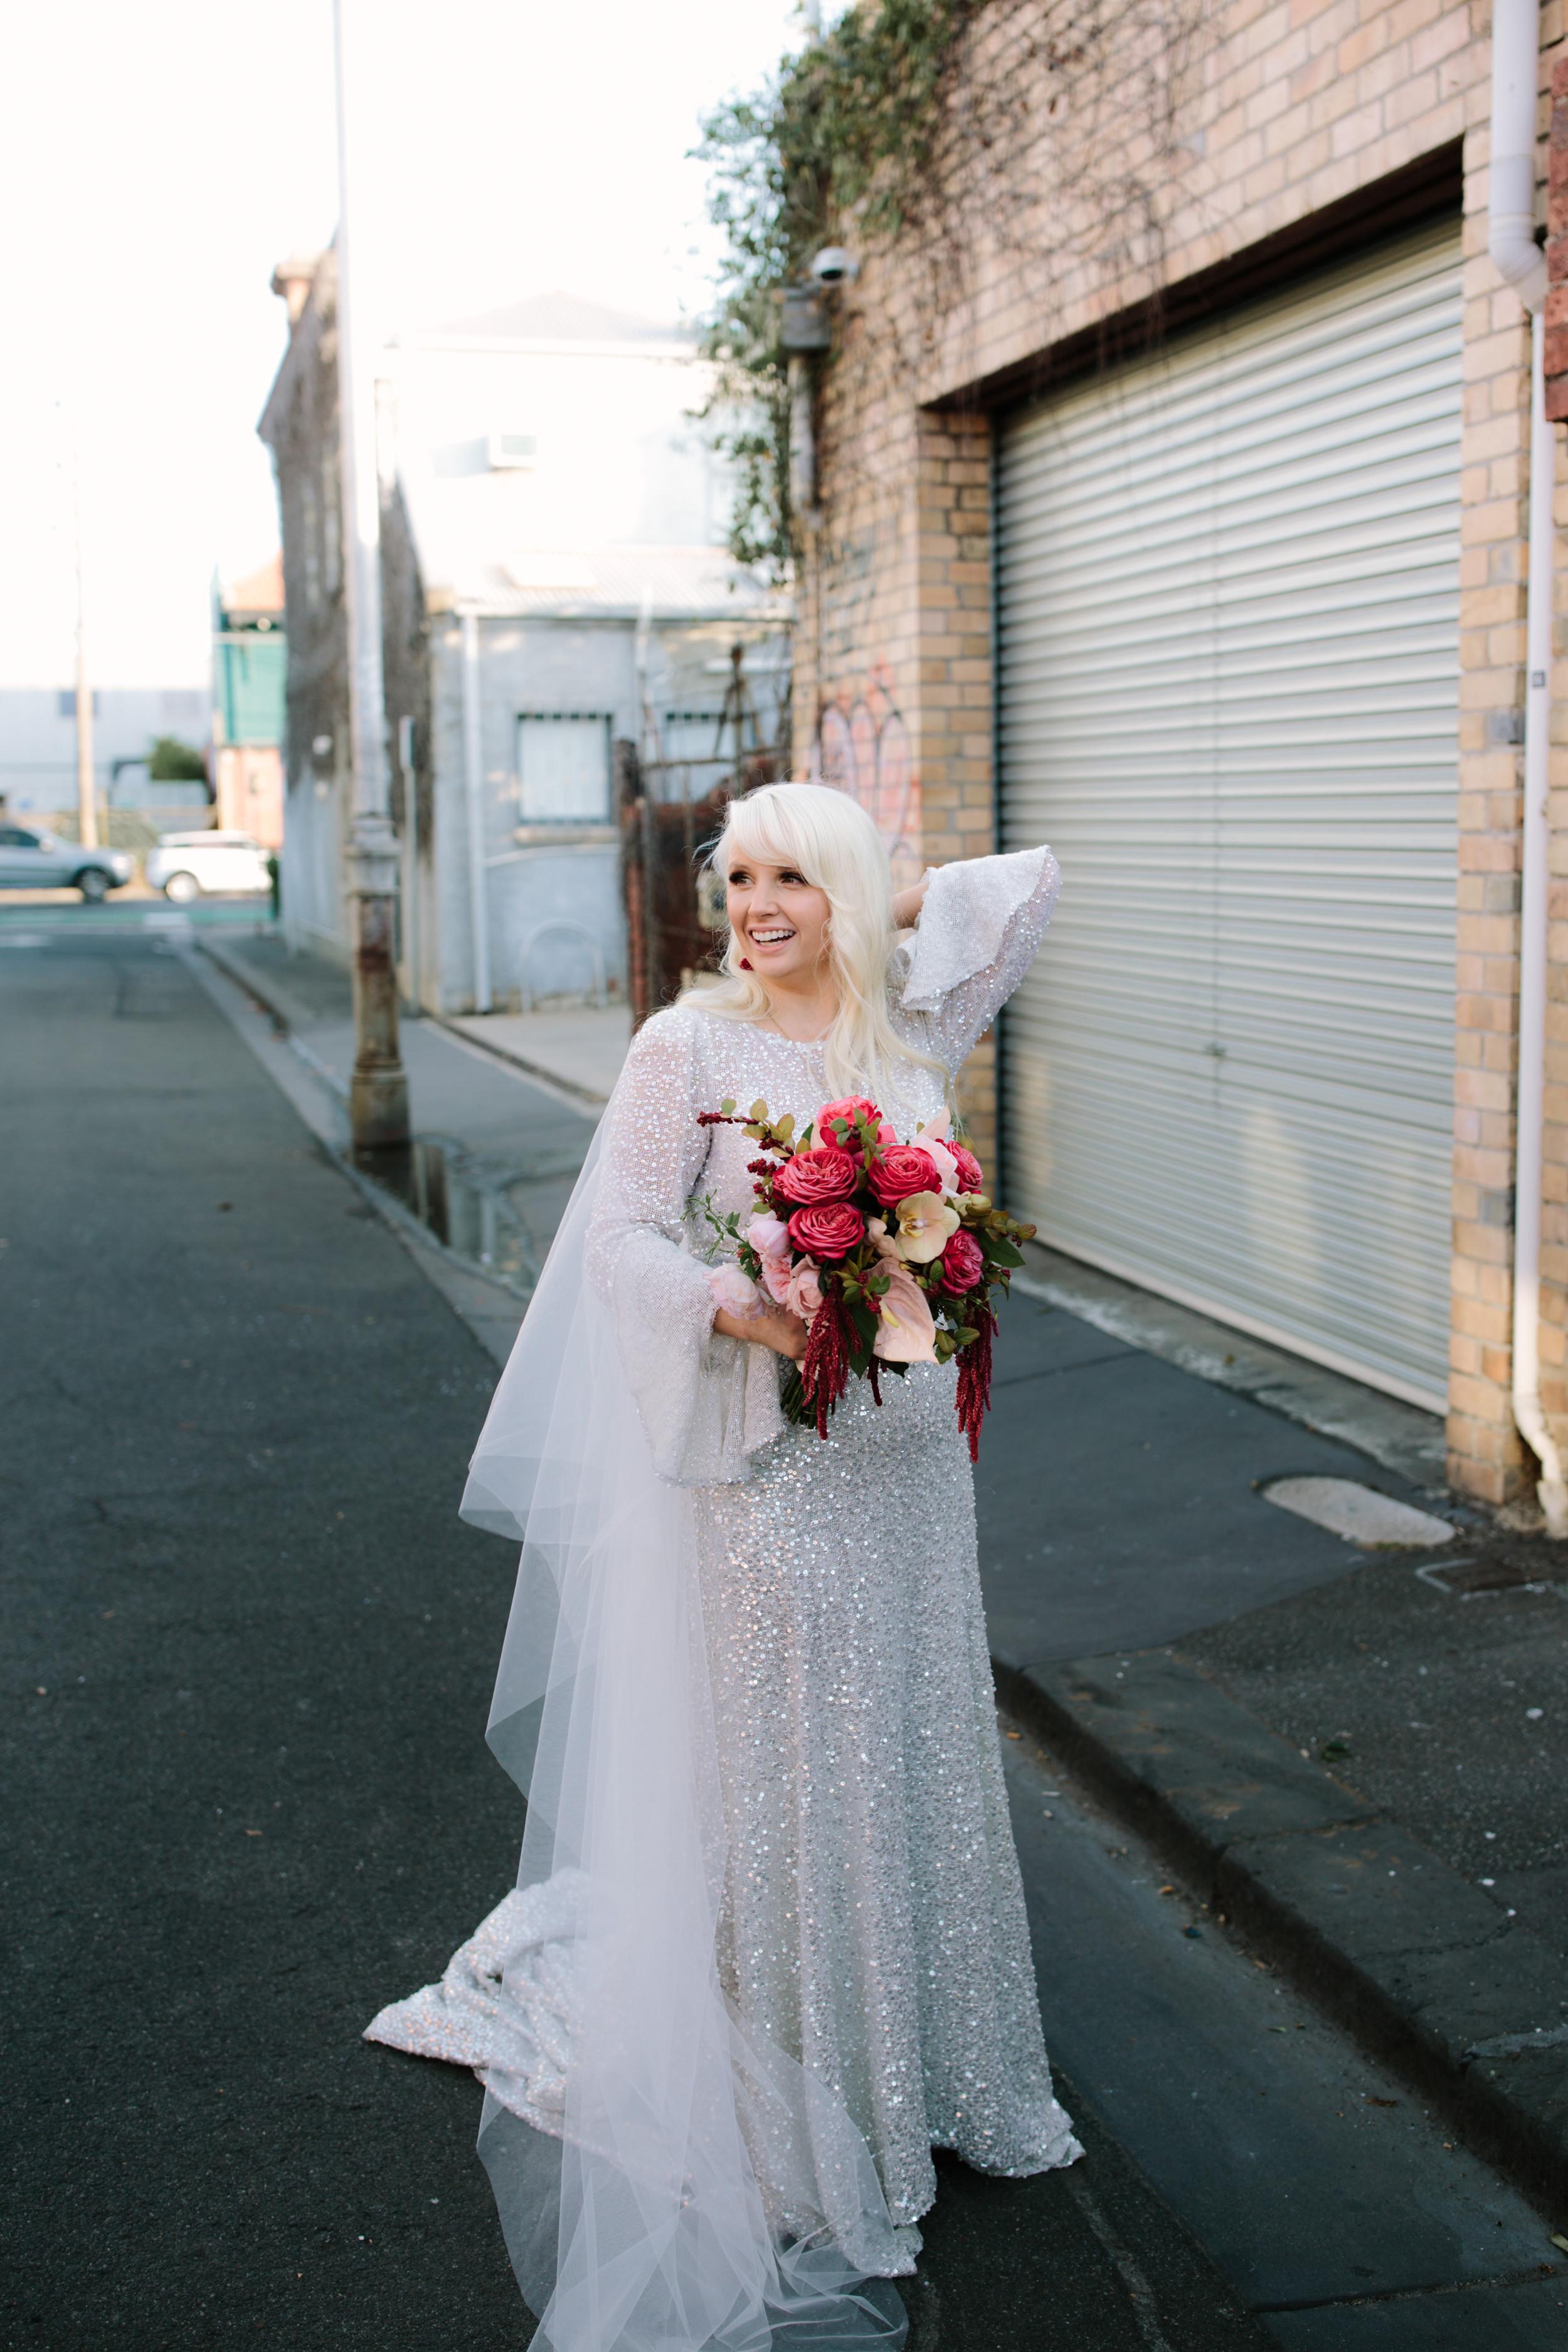 I-Got-You-Babe-Weddings-Tori-Will-Rupert0100.JPG